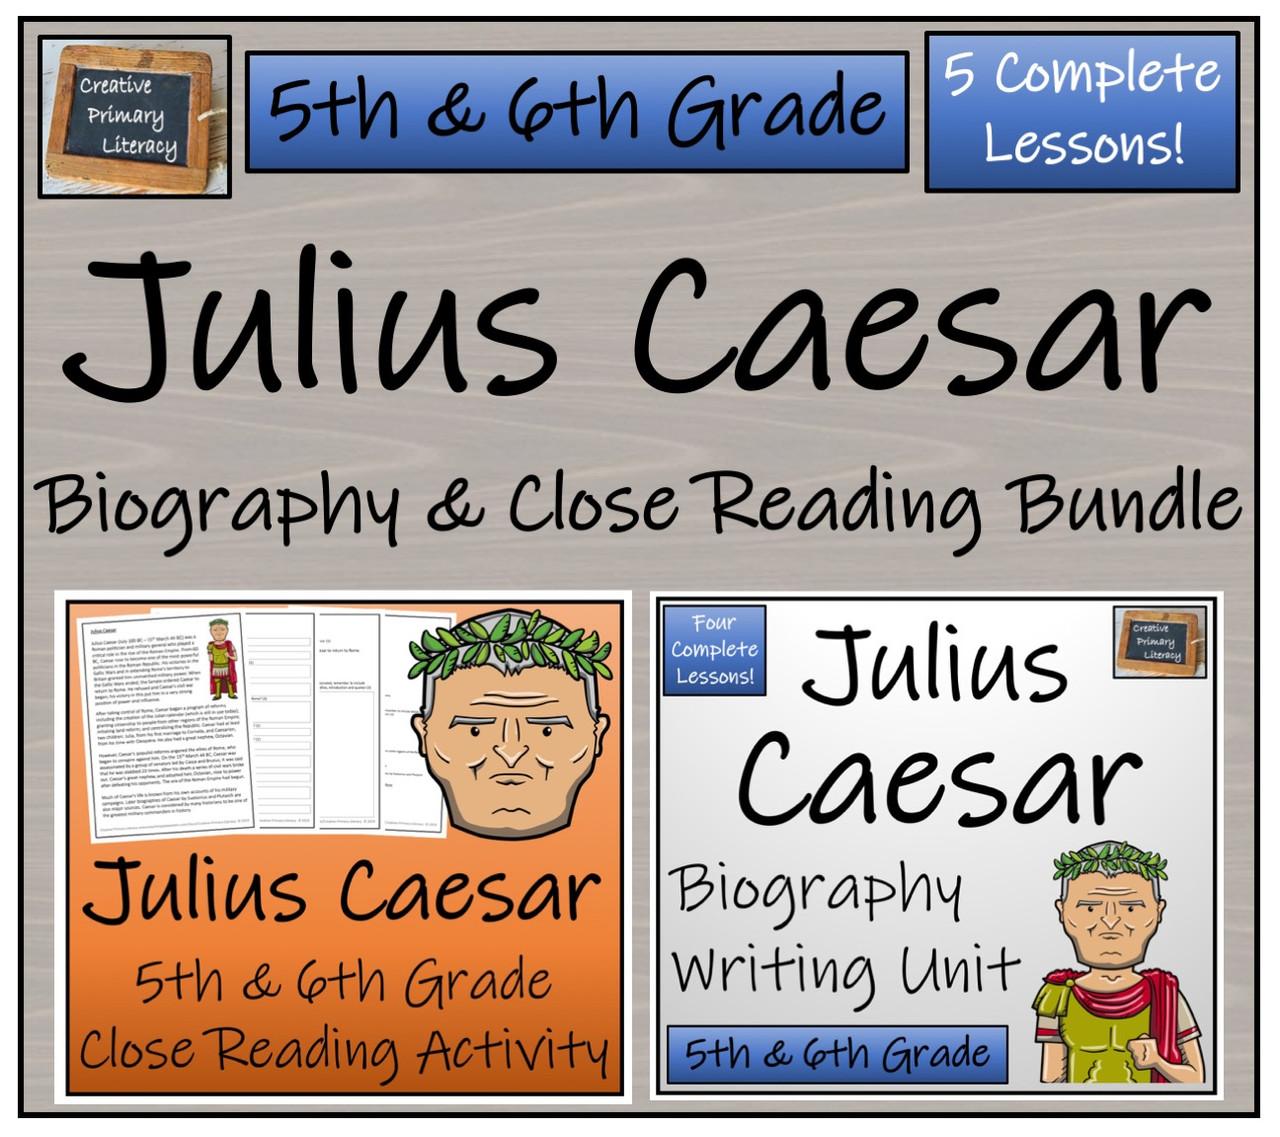 Julius Caesar - 5th & 6th Grade Close Read & Biography Writing Bundle